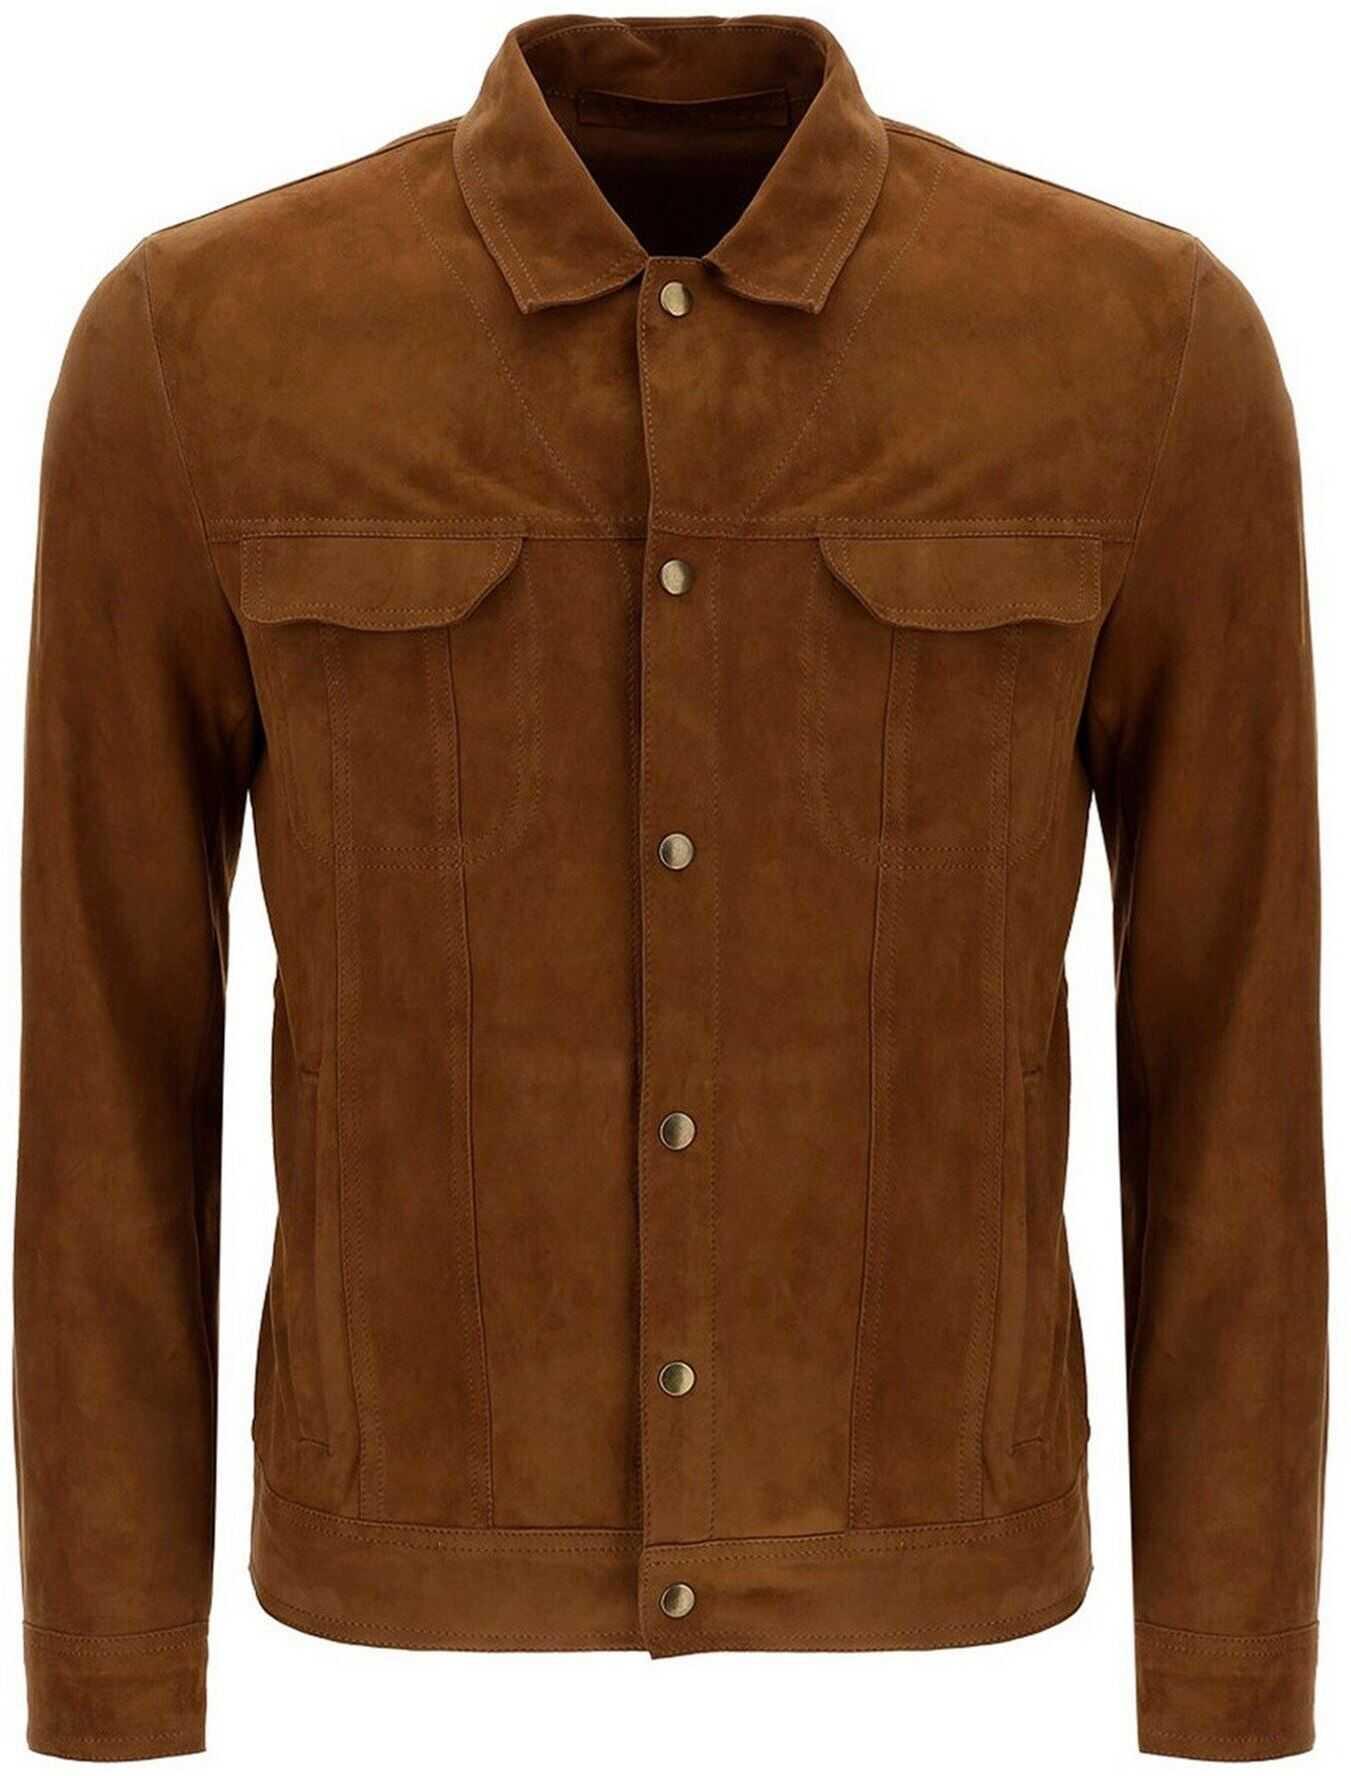 Salvatore Santoro Suede Shirt In Brown Brown imagine